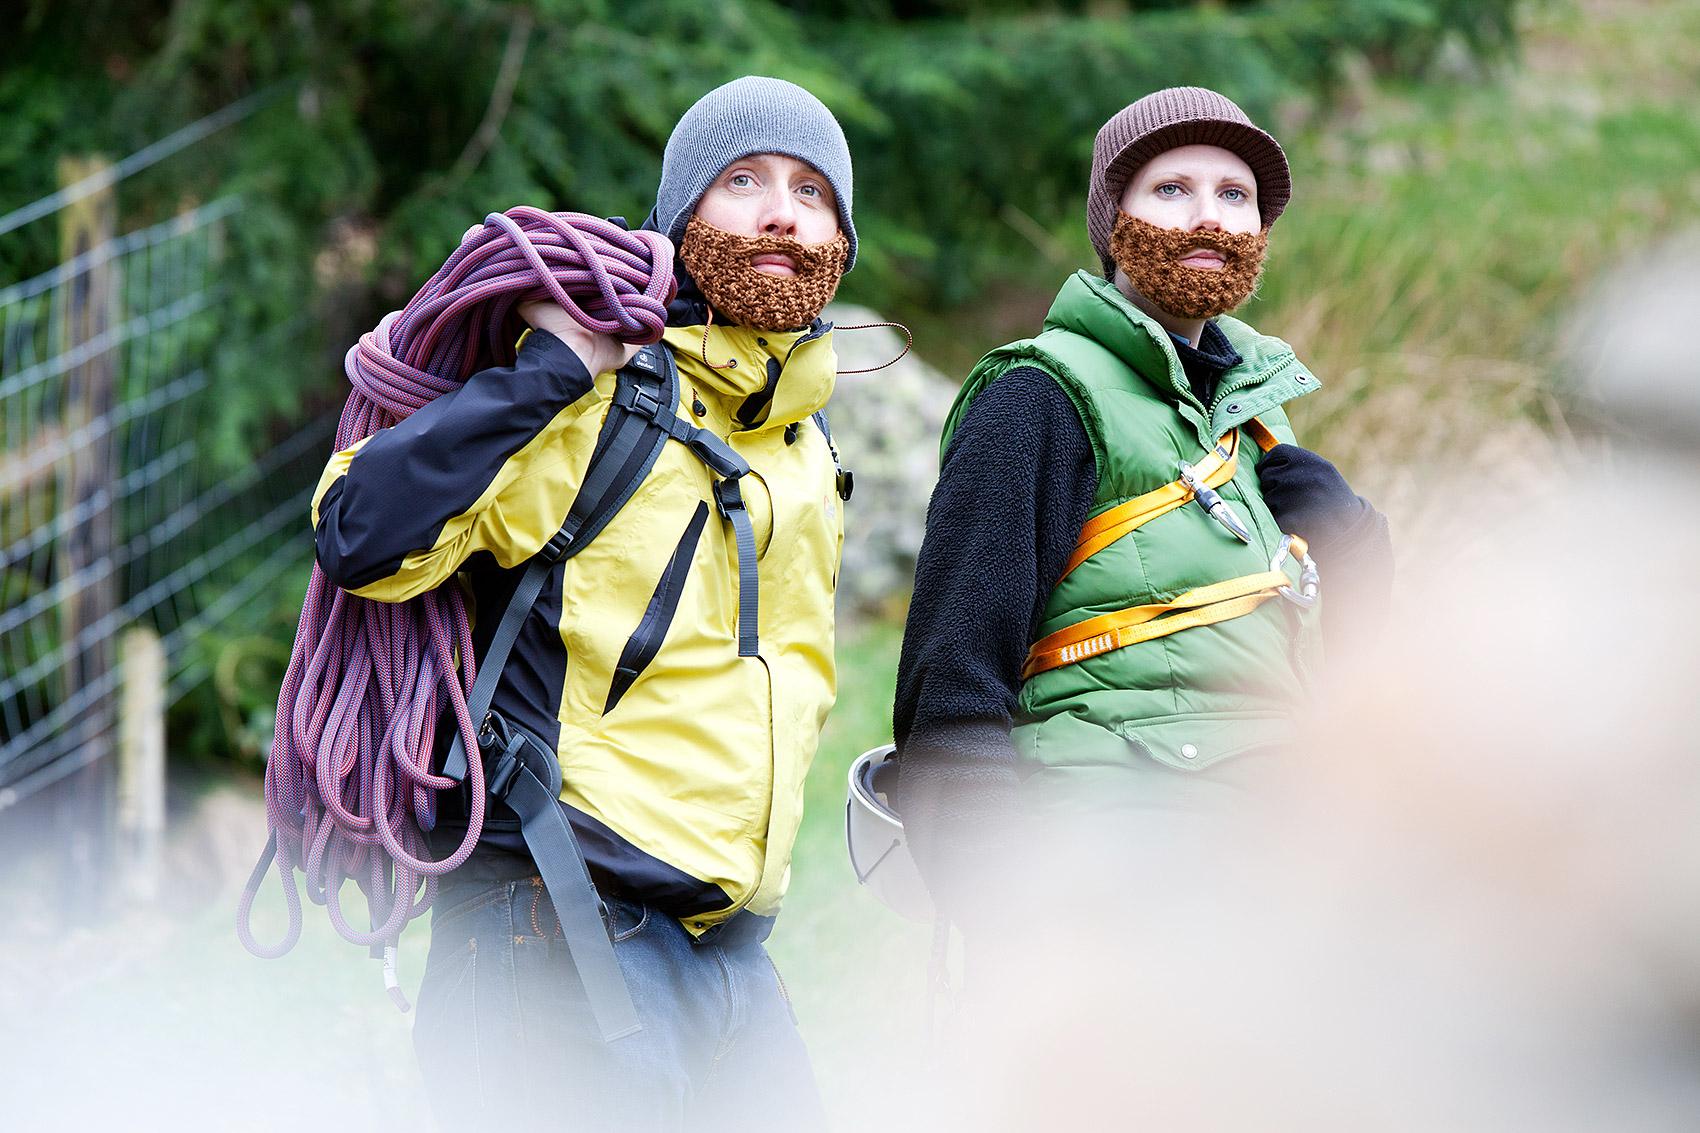 Beard Beanies - climbers